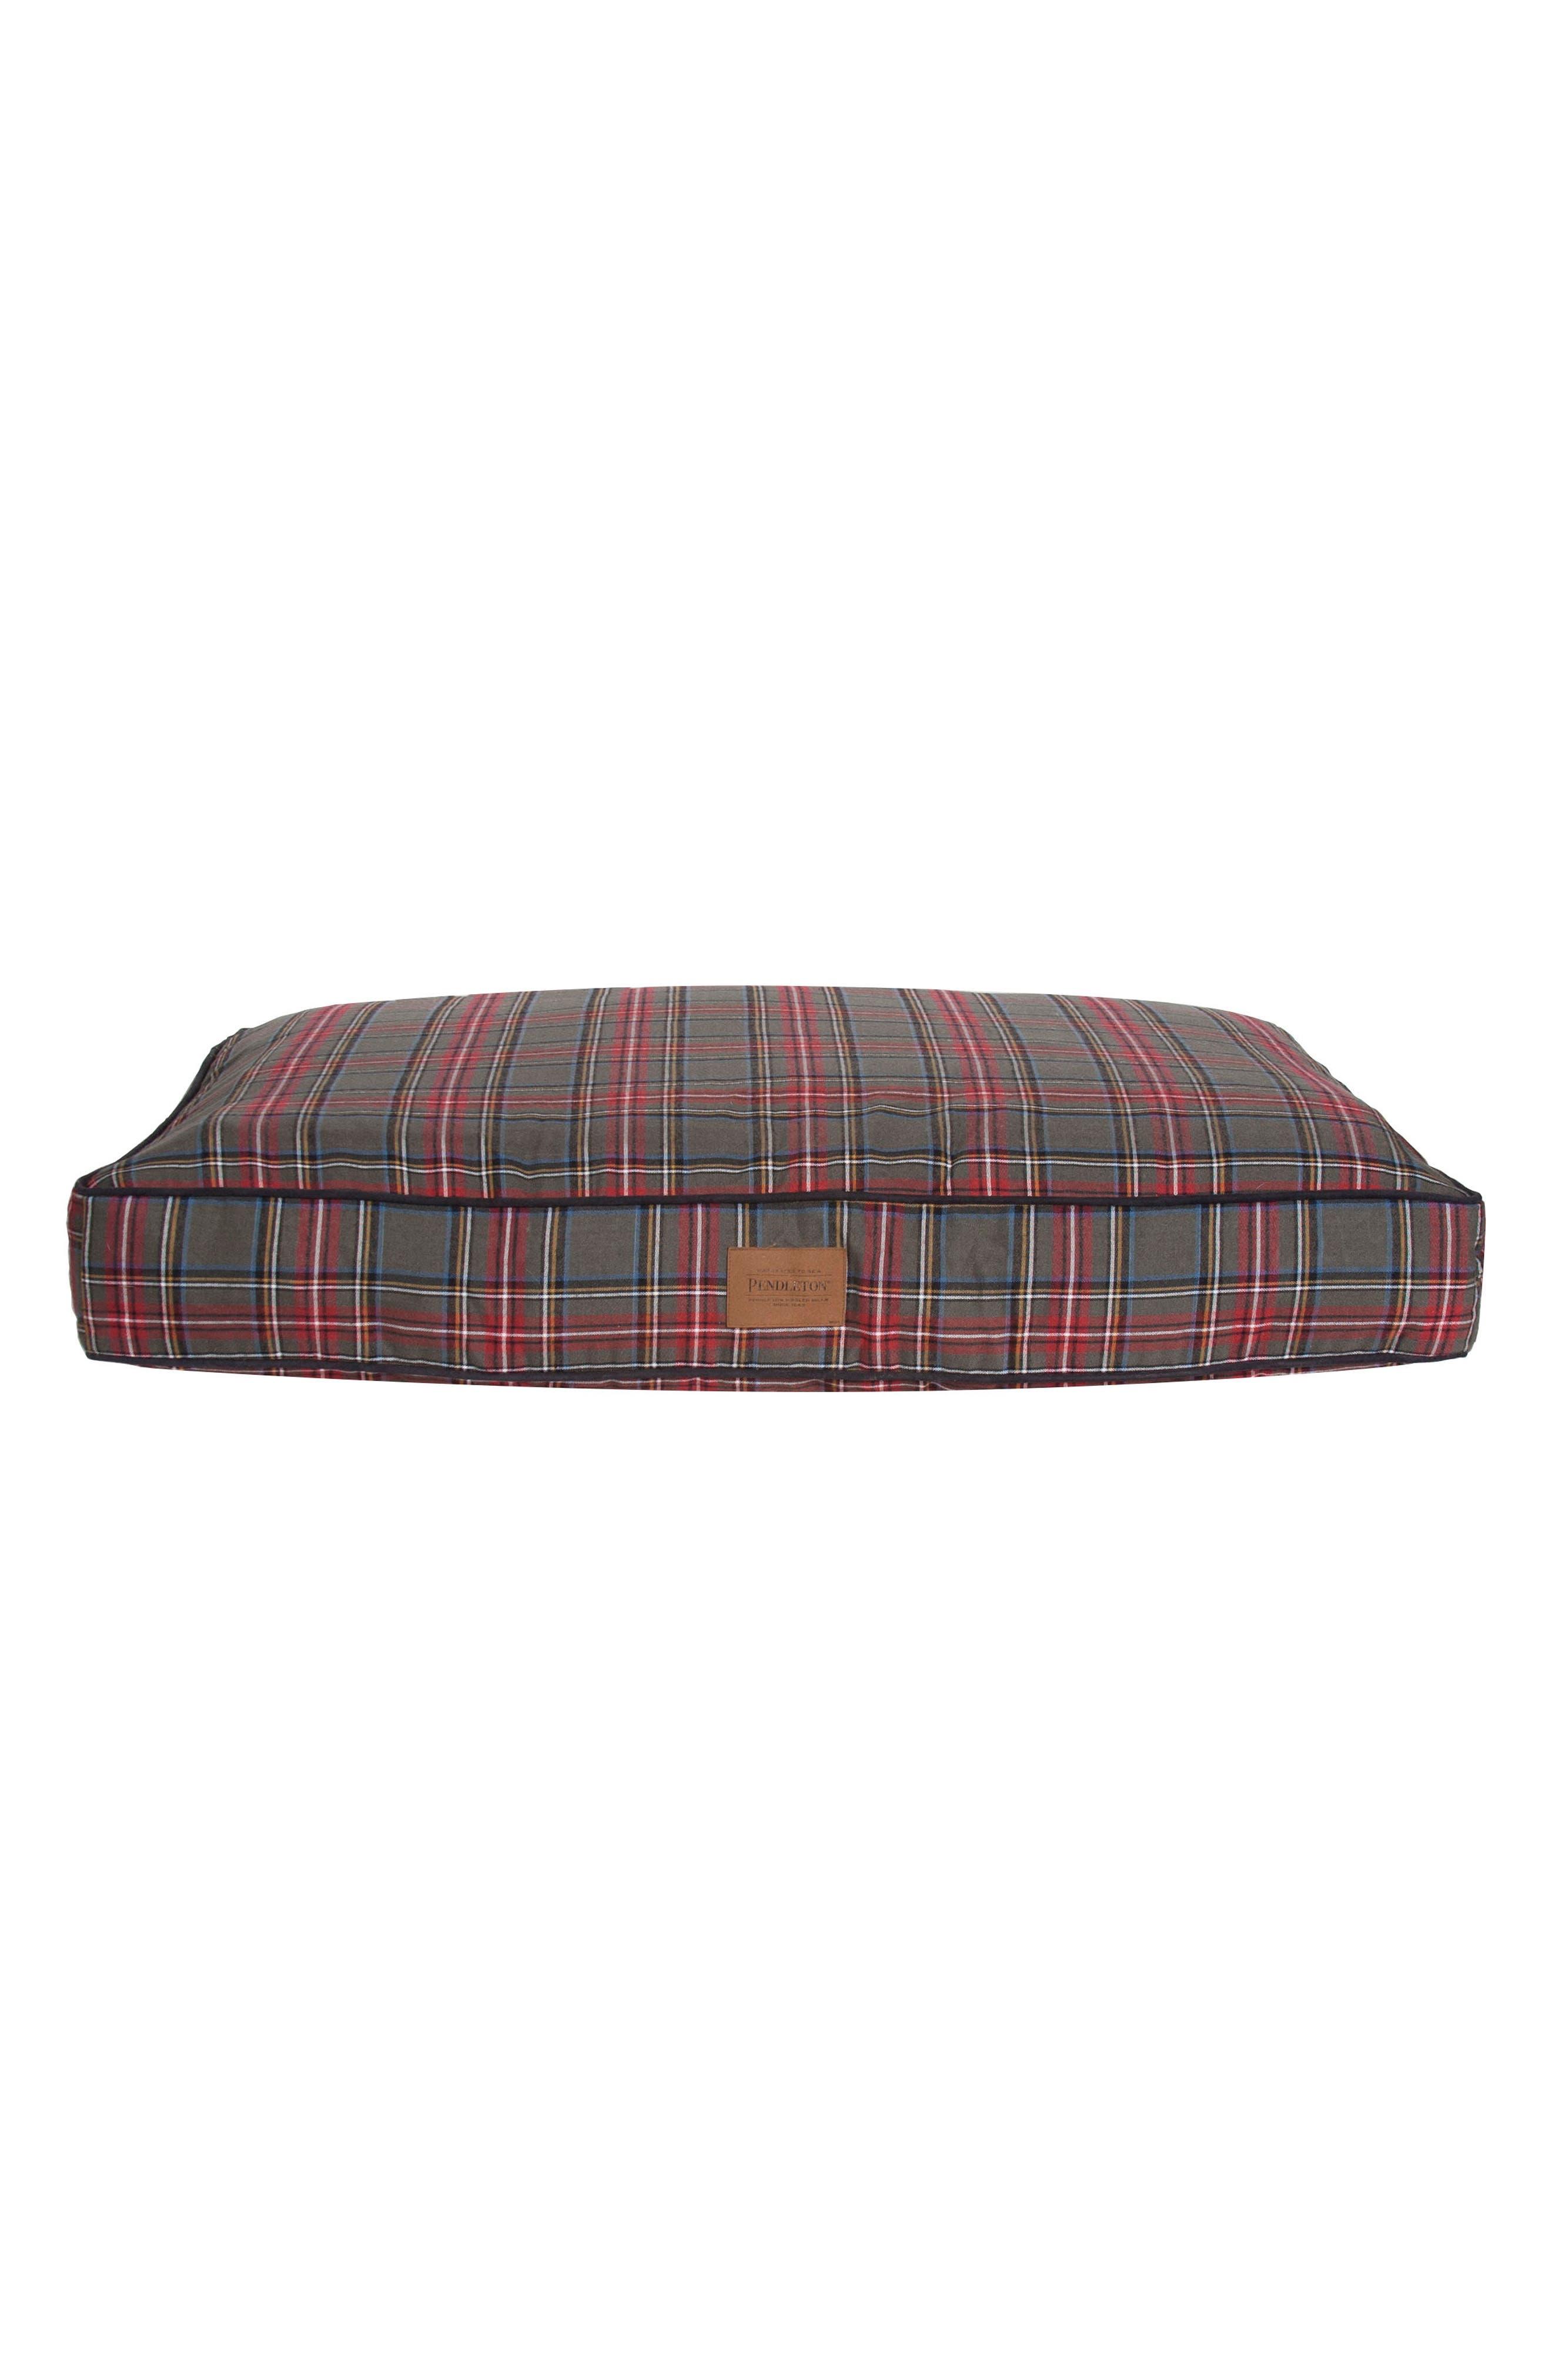 Main Image - Carolina Pet Company x Pendleton Classics Tartan Pet Bed